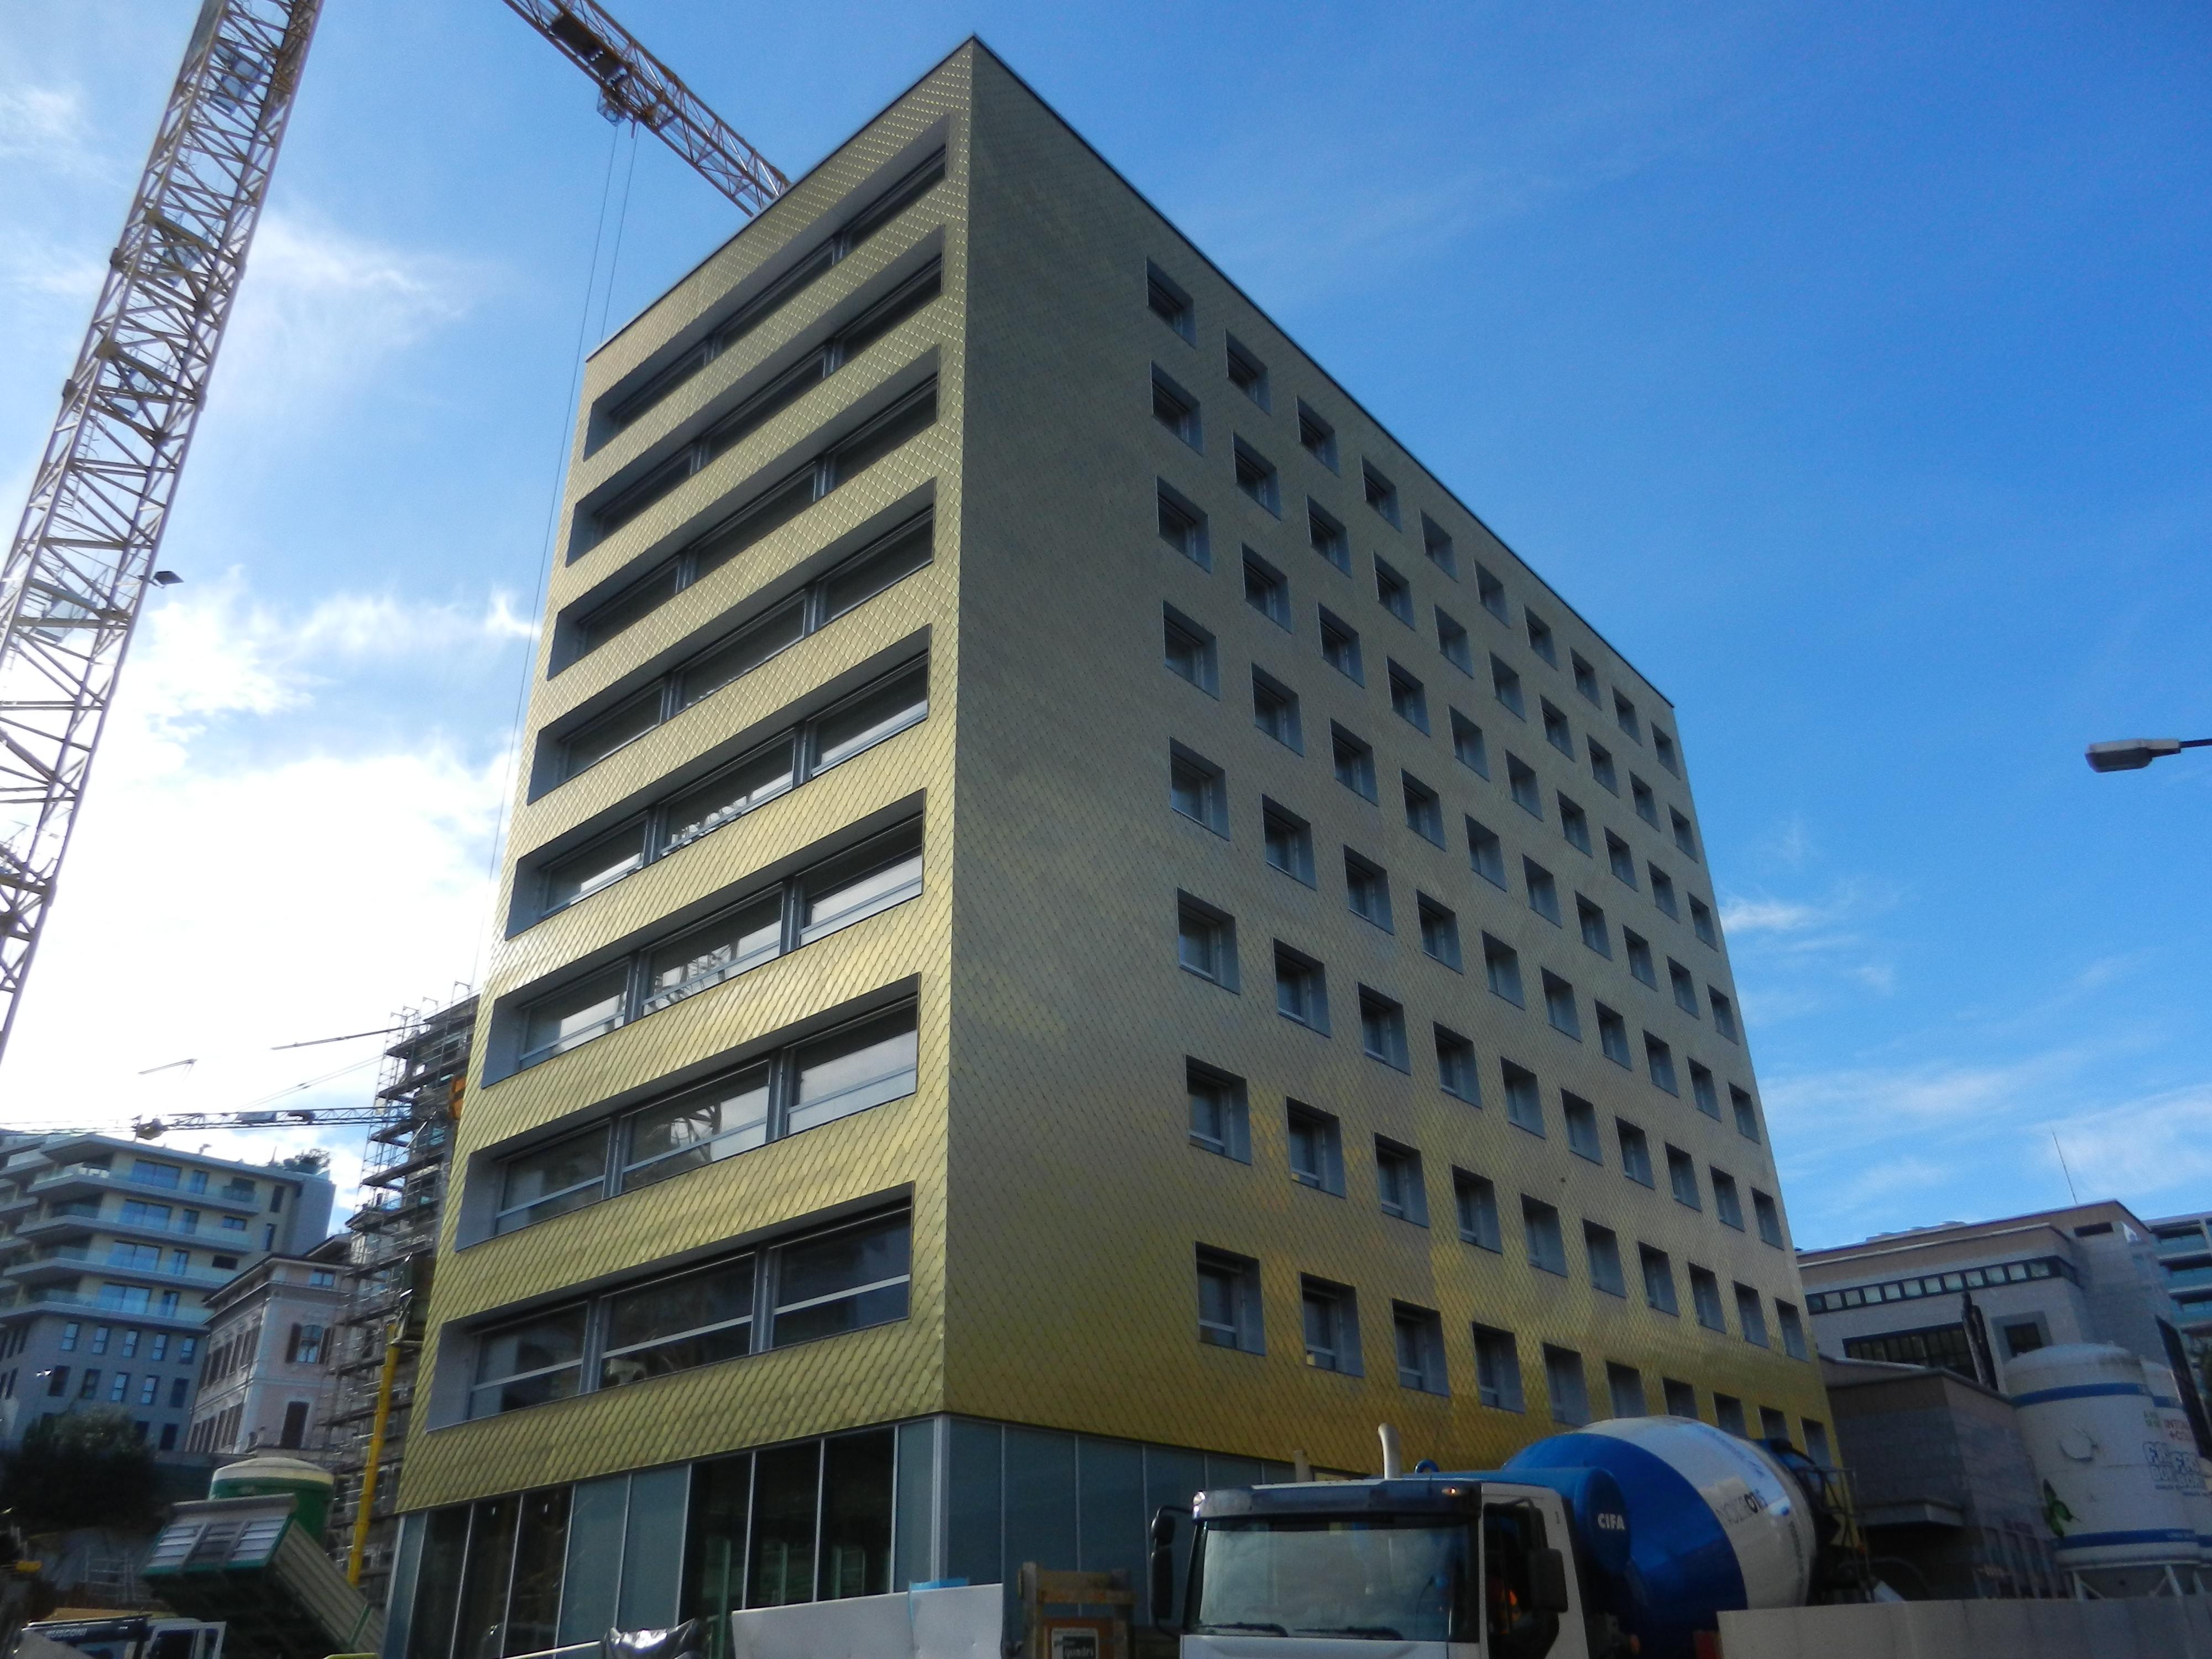 2015 Lugano-Paradiso La Residenza